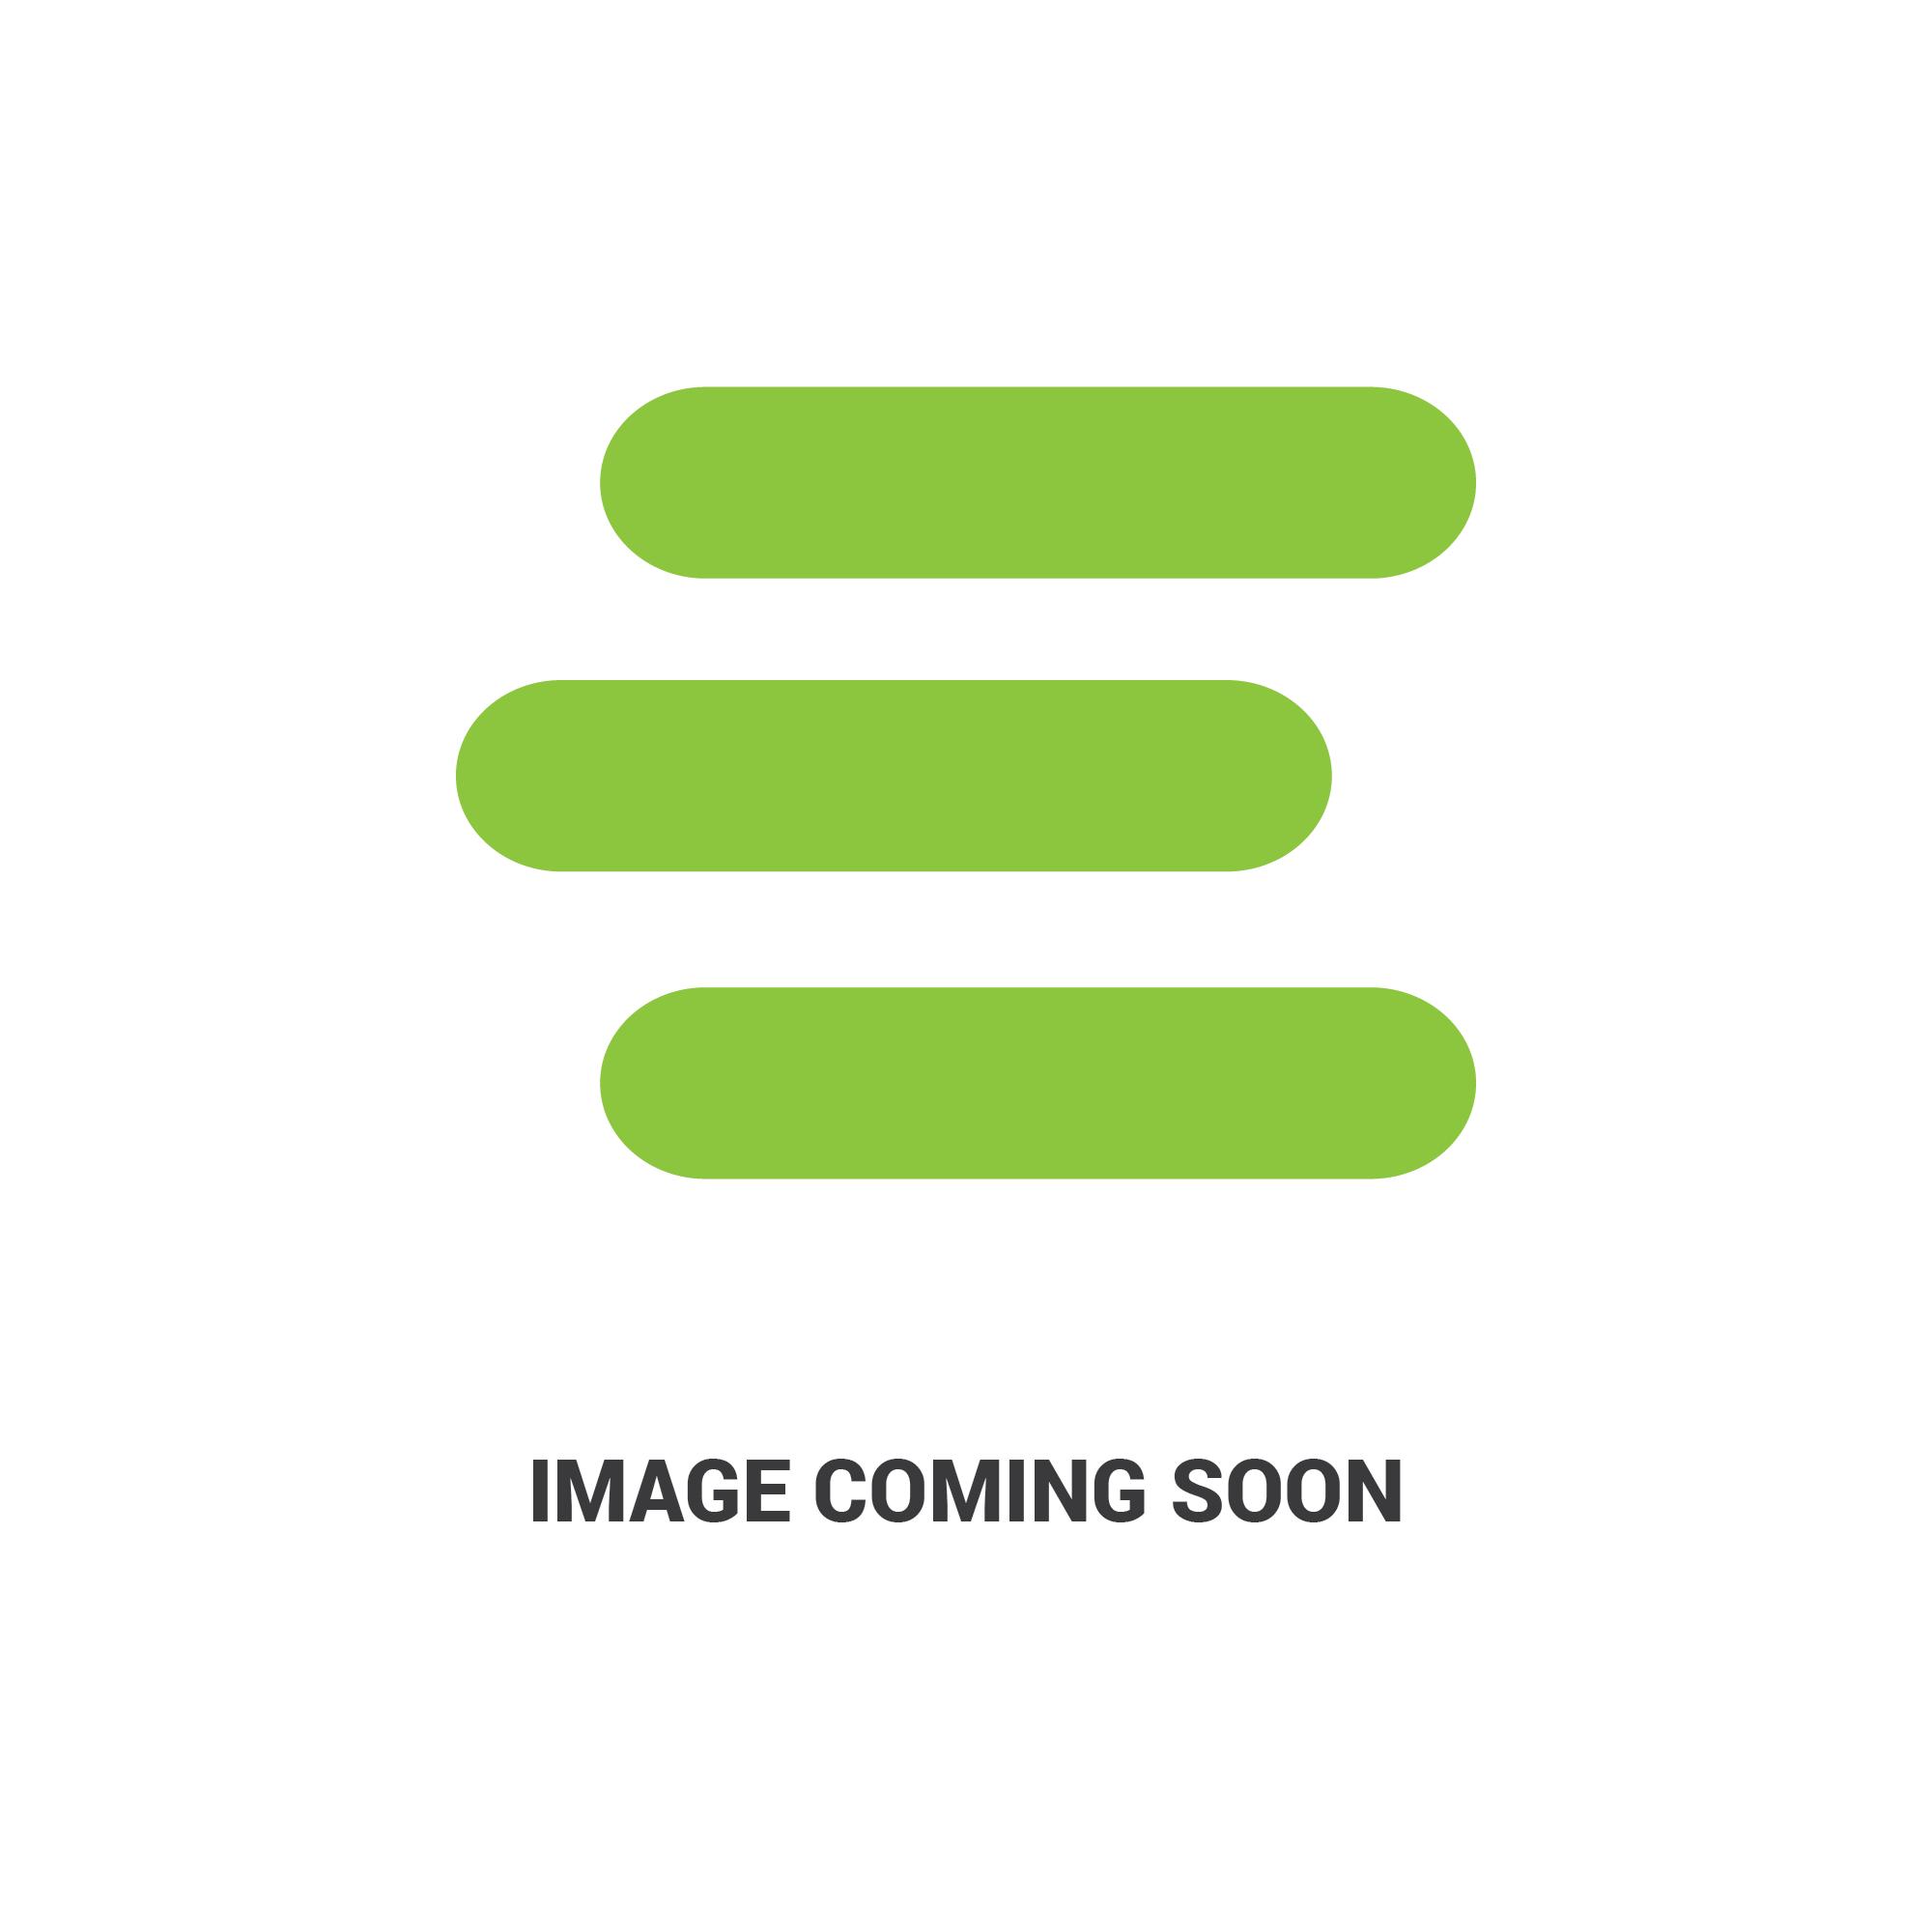 E-66808521230_1.jpg